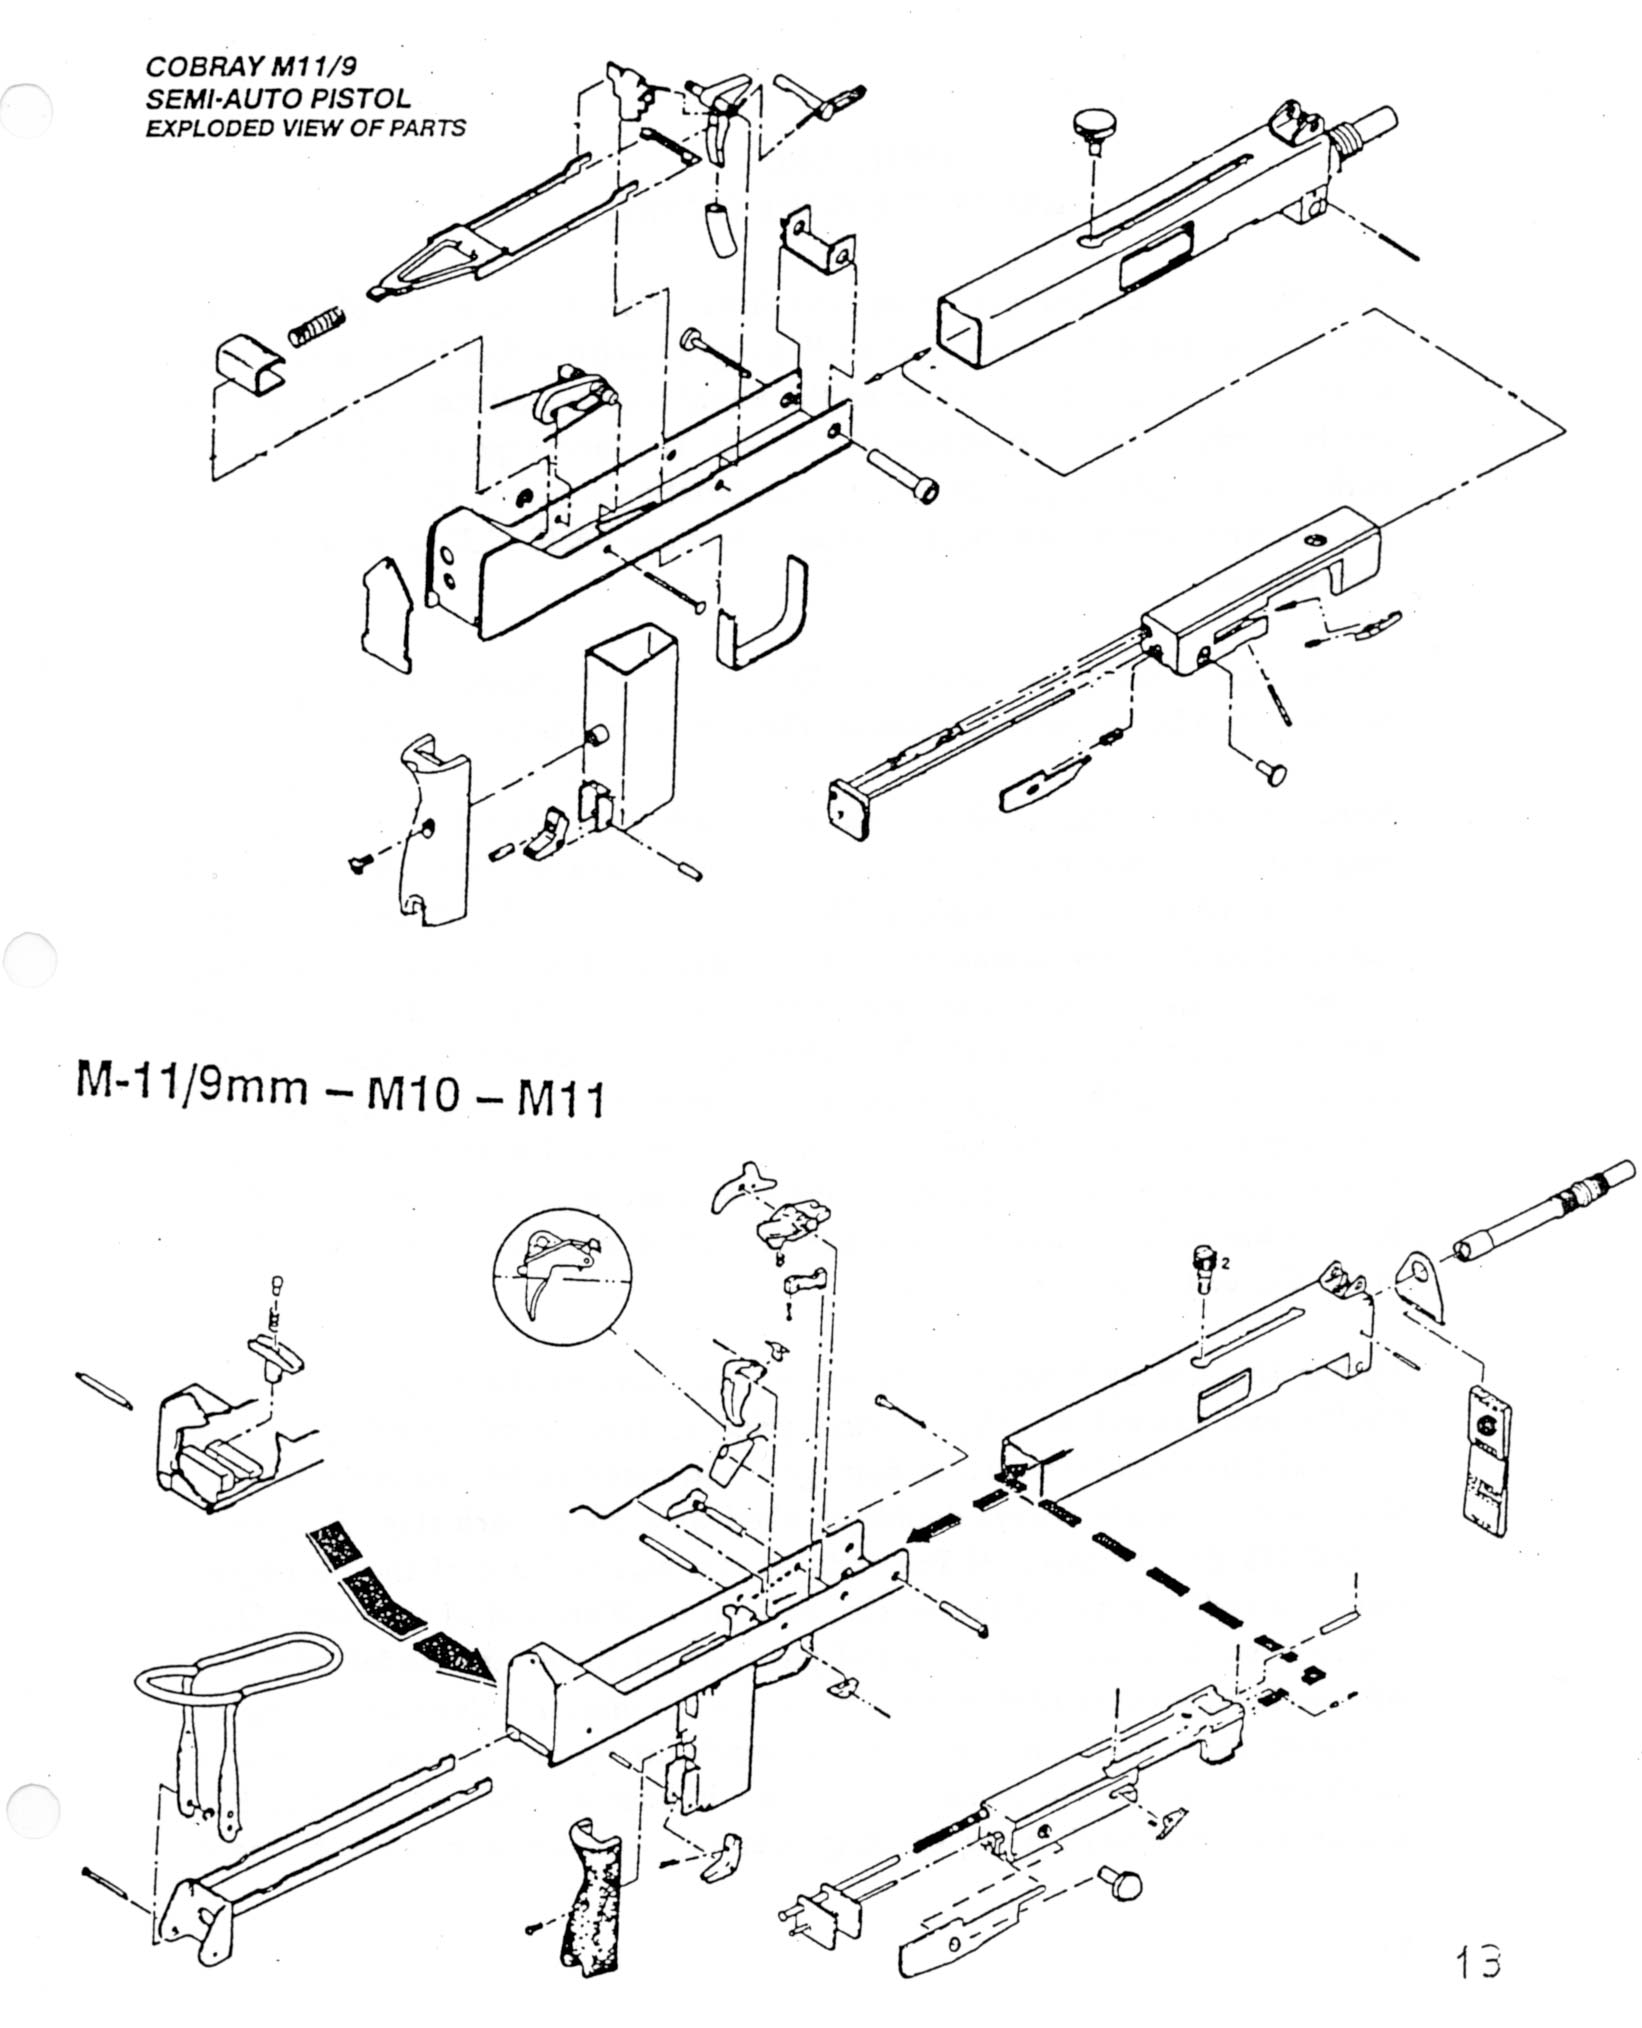 Cobray M11 Full Auto Diagram Mac 10 Conversion Wire Diagrams Wiring Find U2022 Parts Info